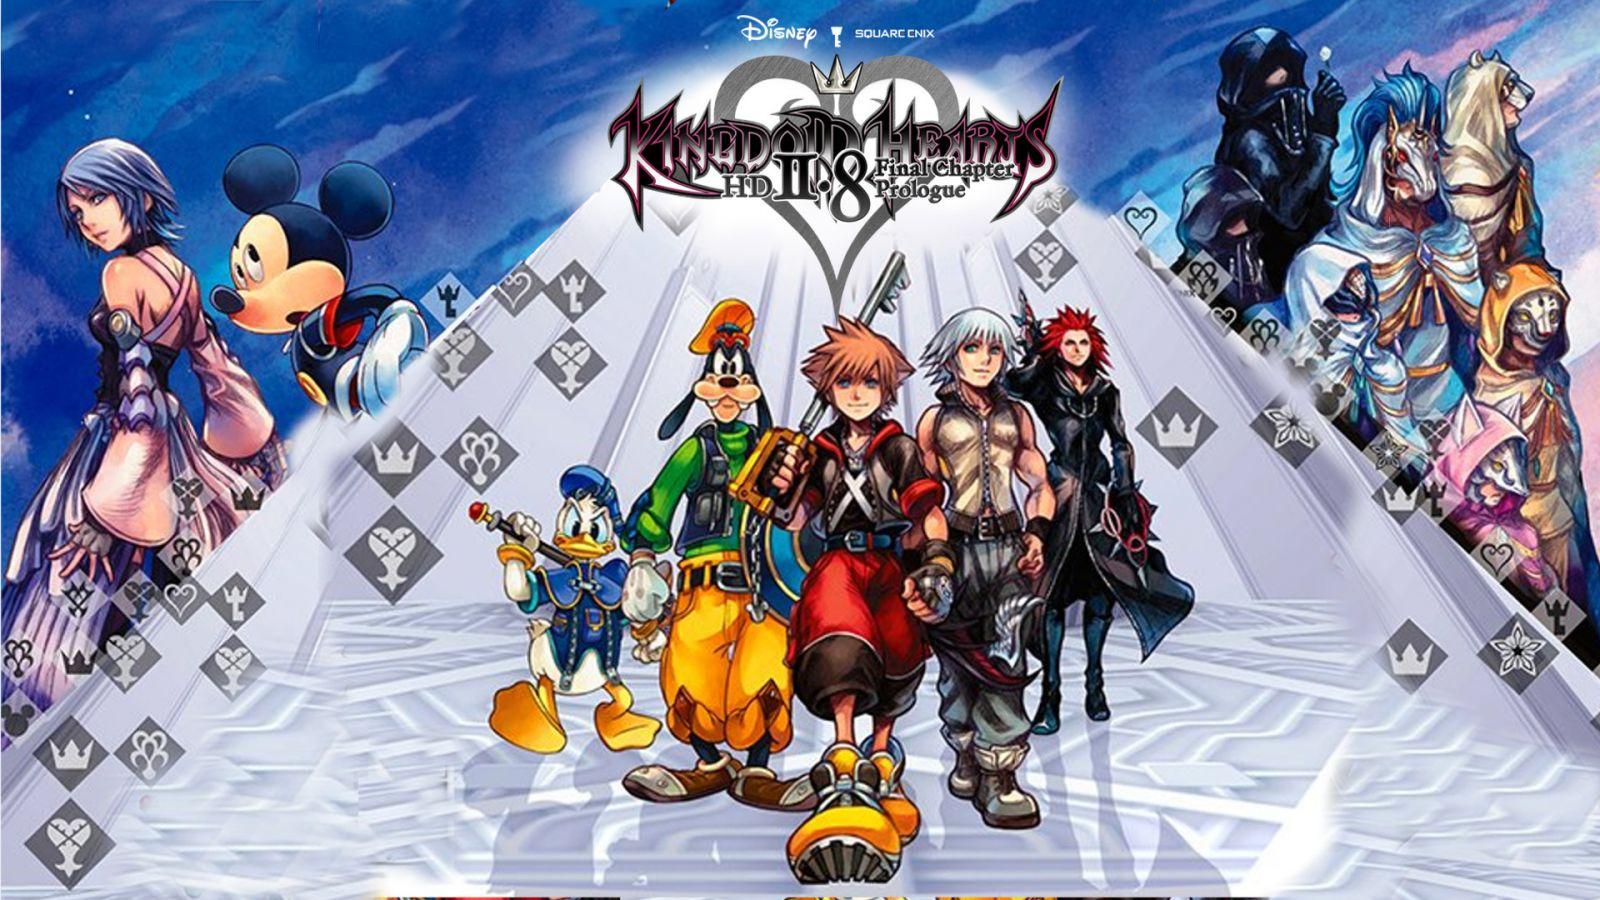 Kingdom Hearts Hd 2 8 Cover Art Wallpaper Wallpapers Kh13